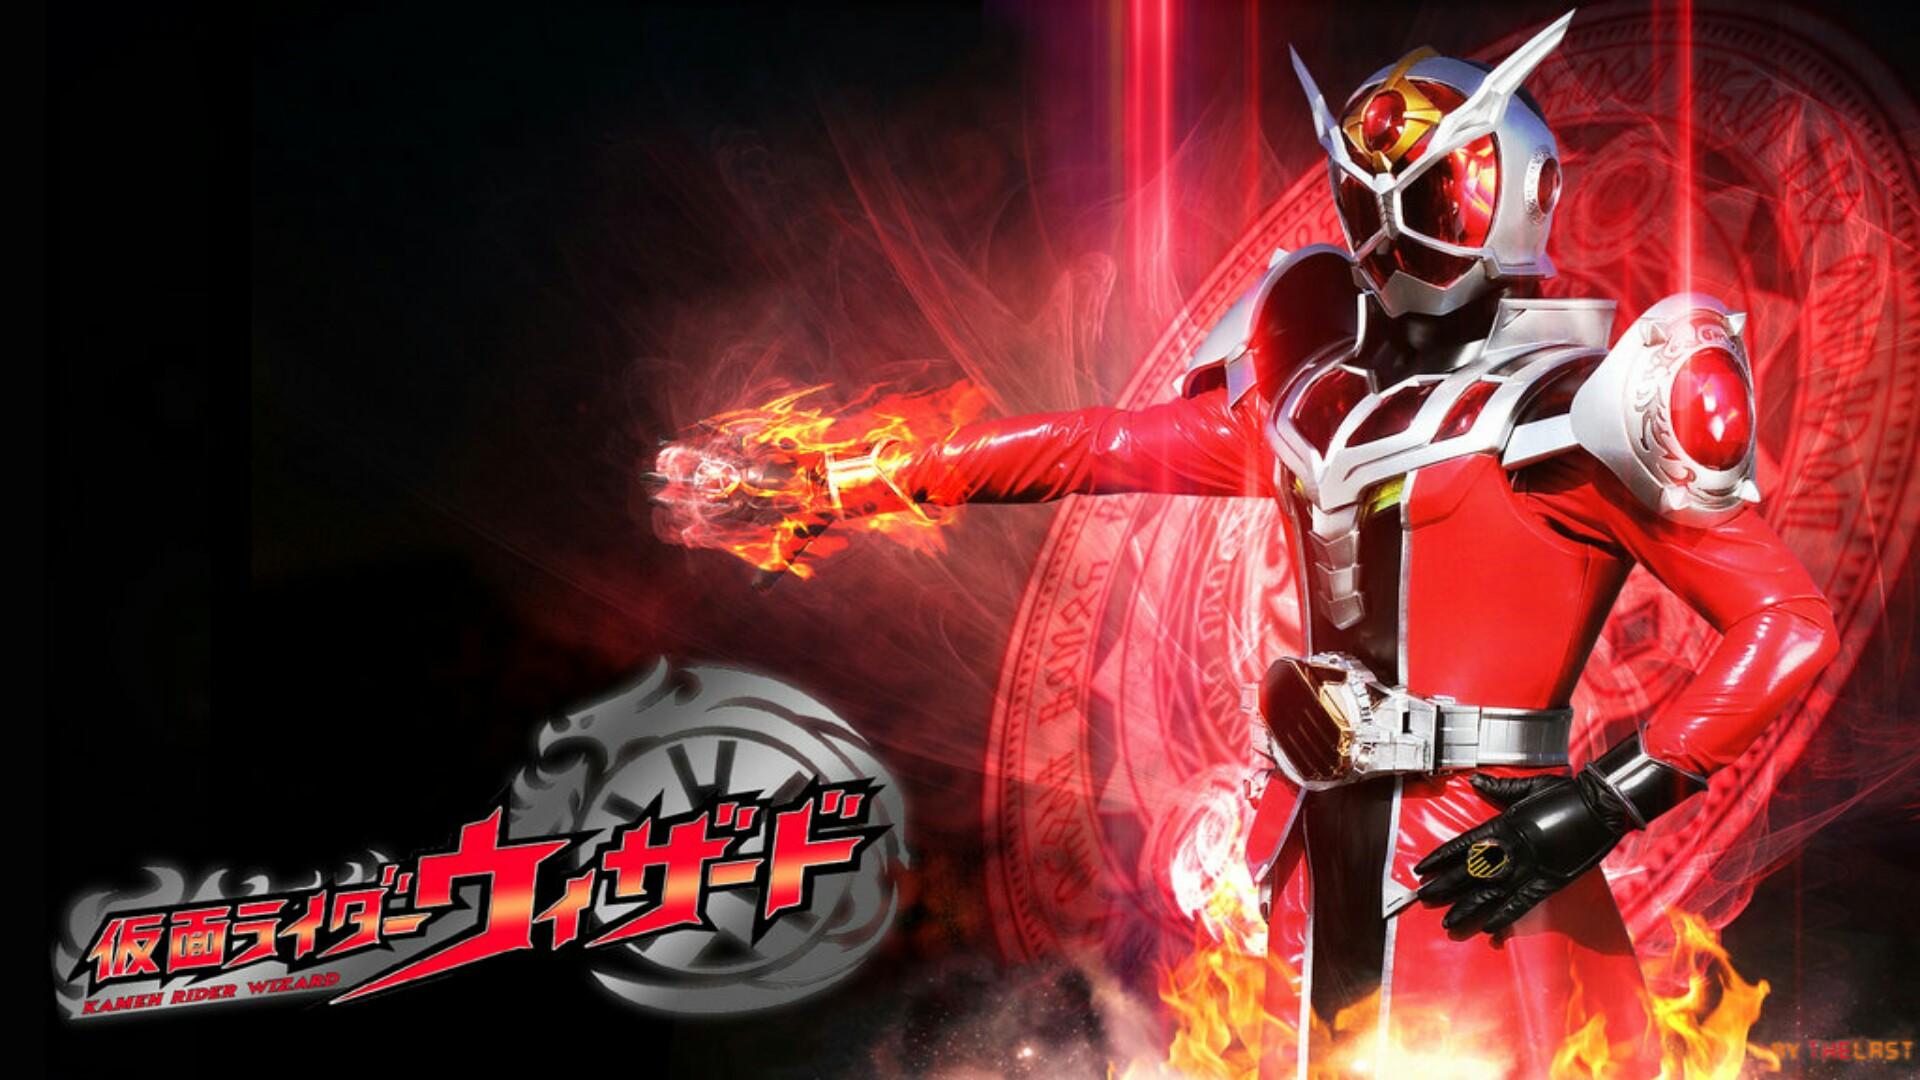 Persona 5 Girls Wallpaper Kamen Rider Wizard 02 Ps4wallpapers Com